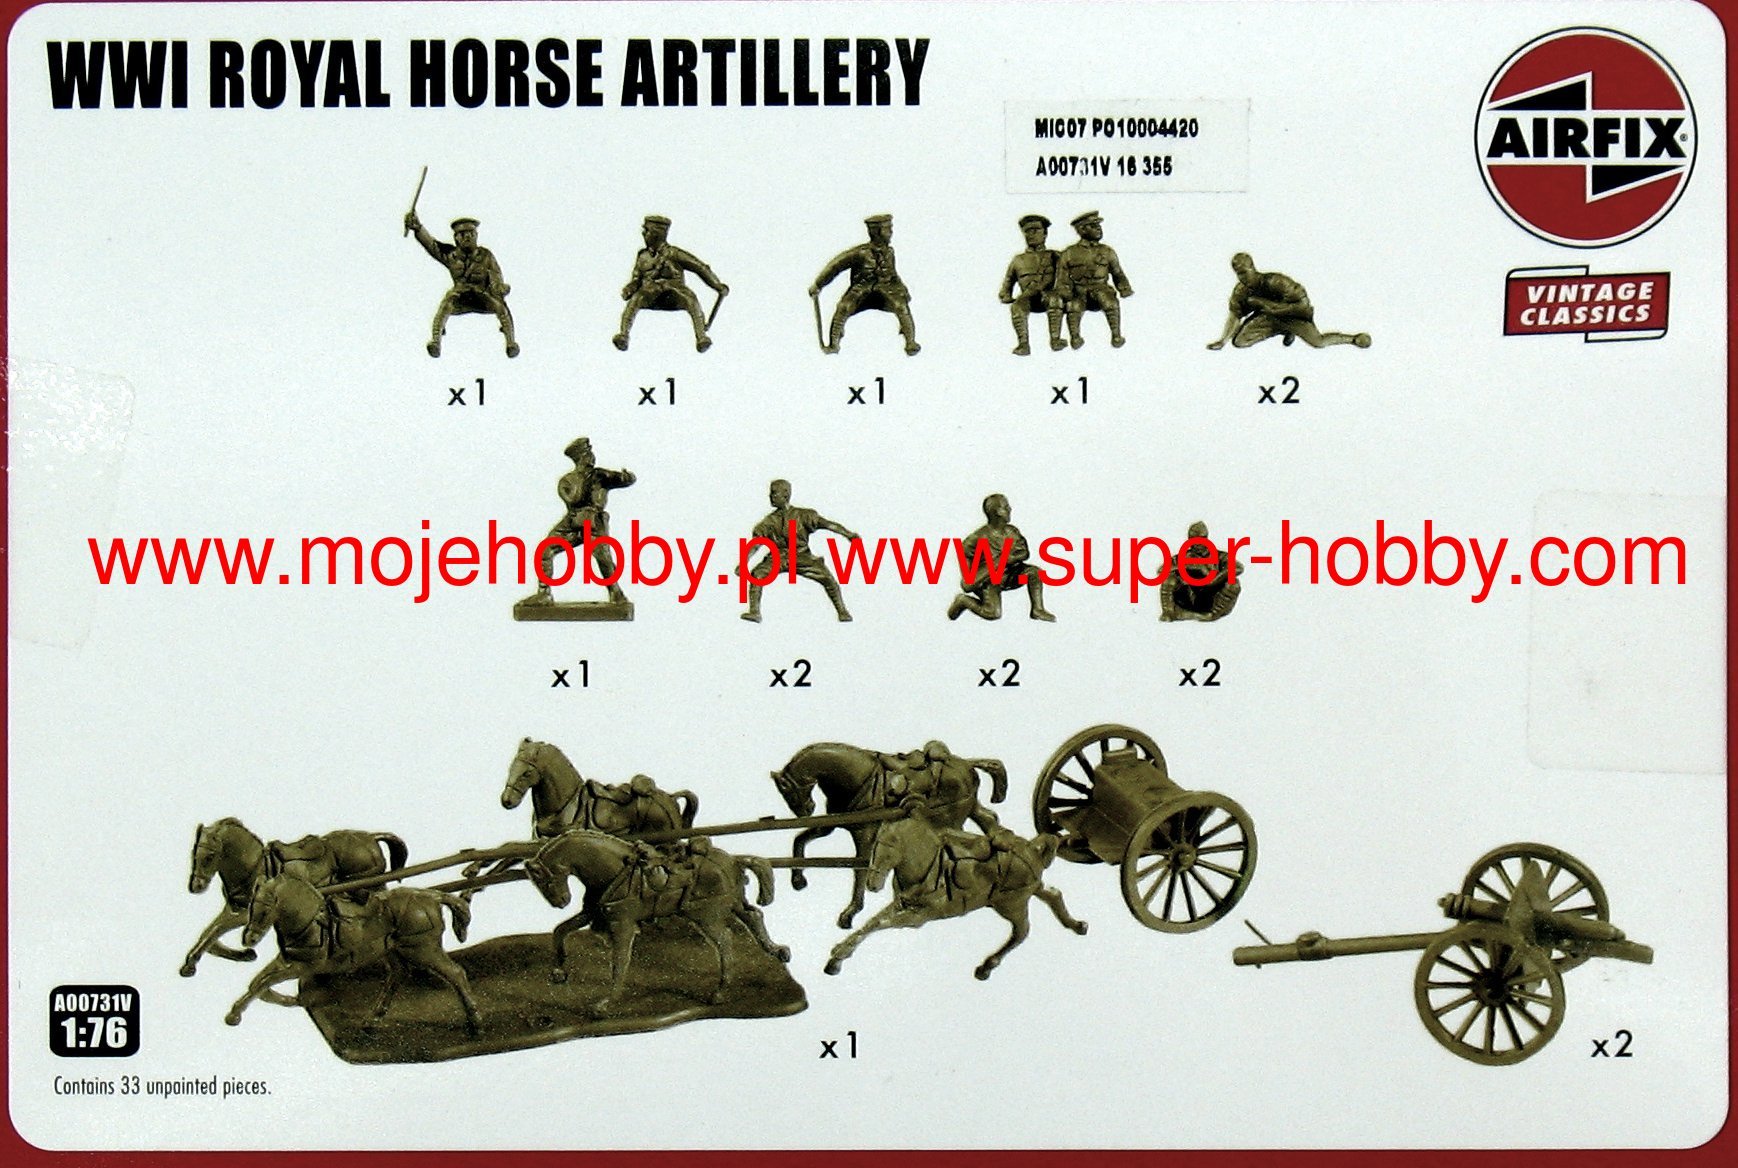 1//76 Scale Airfix 0731 WW1 British Royal Horse Artillery